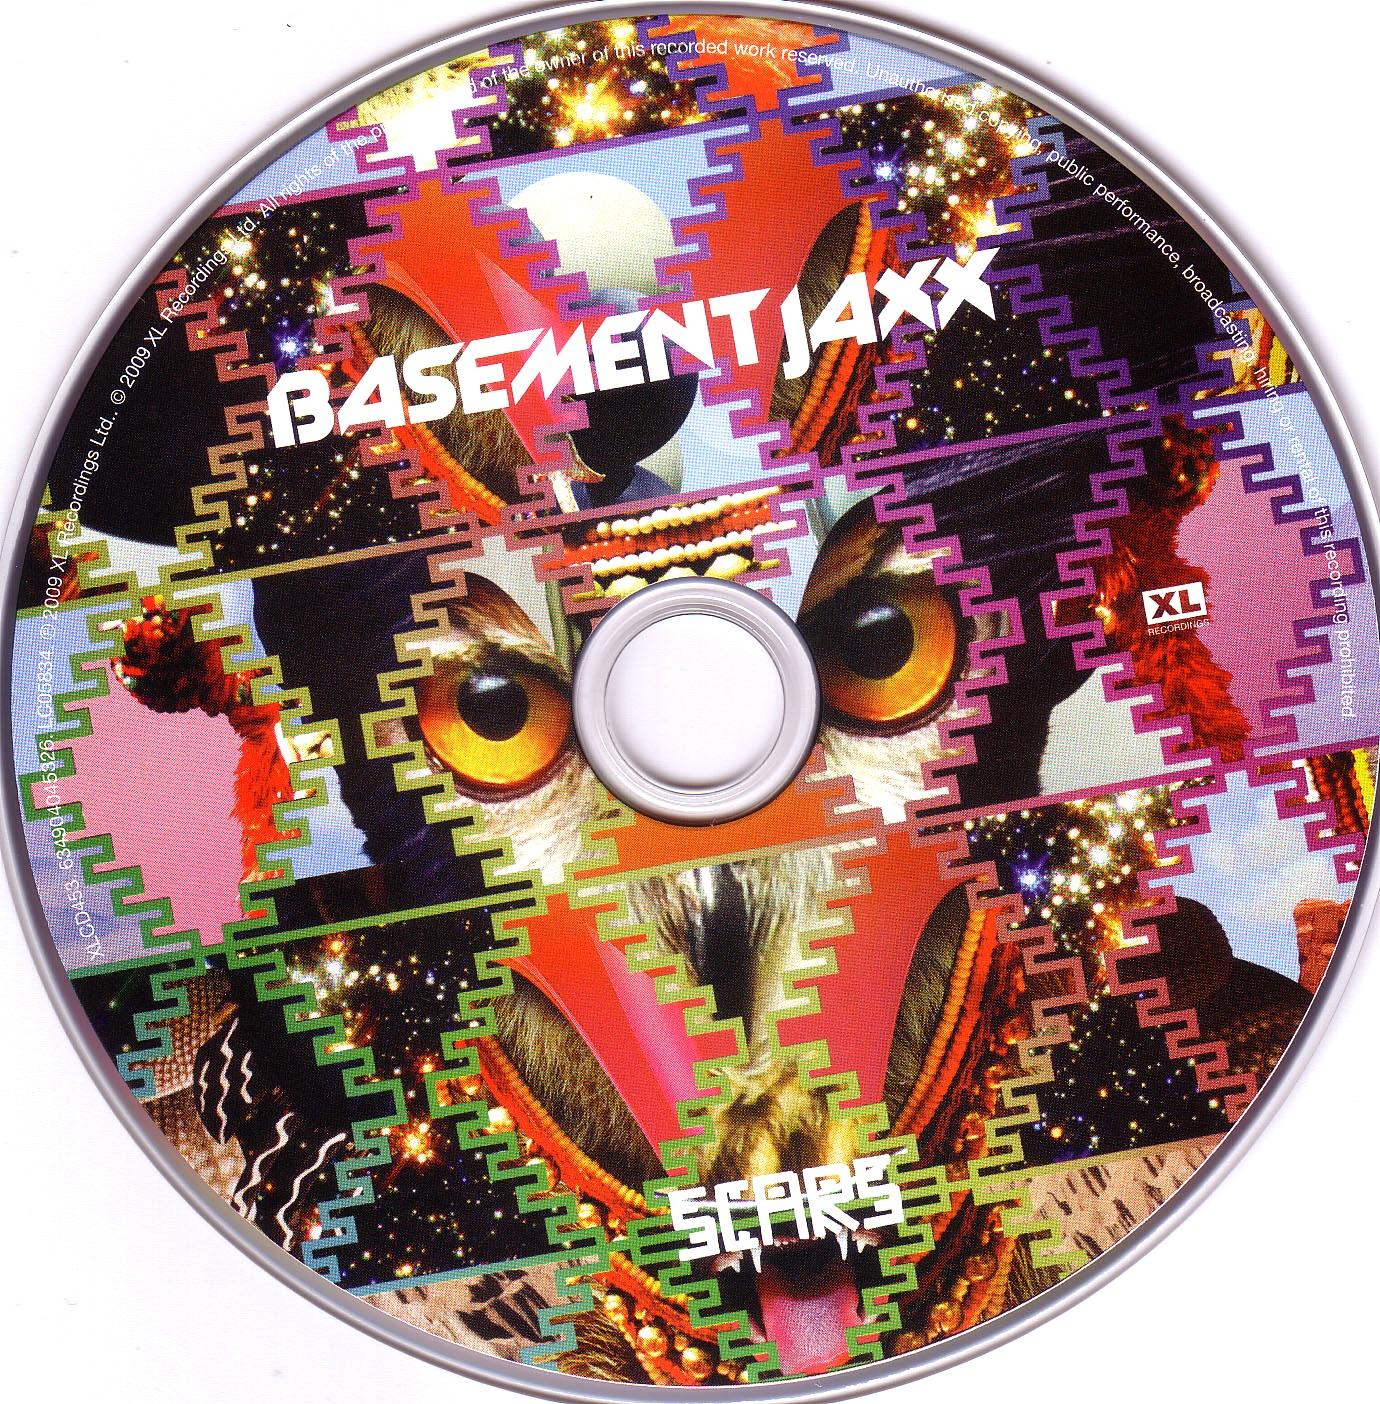 cd basement jaxx scars cd scarica la cover cd basement jaxx